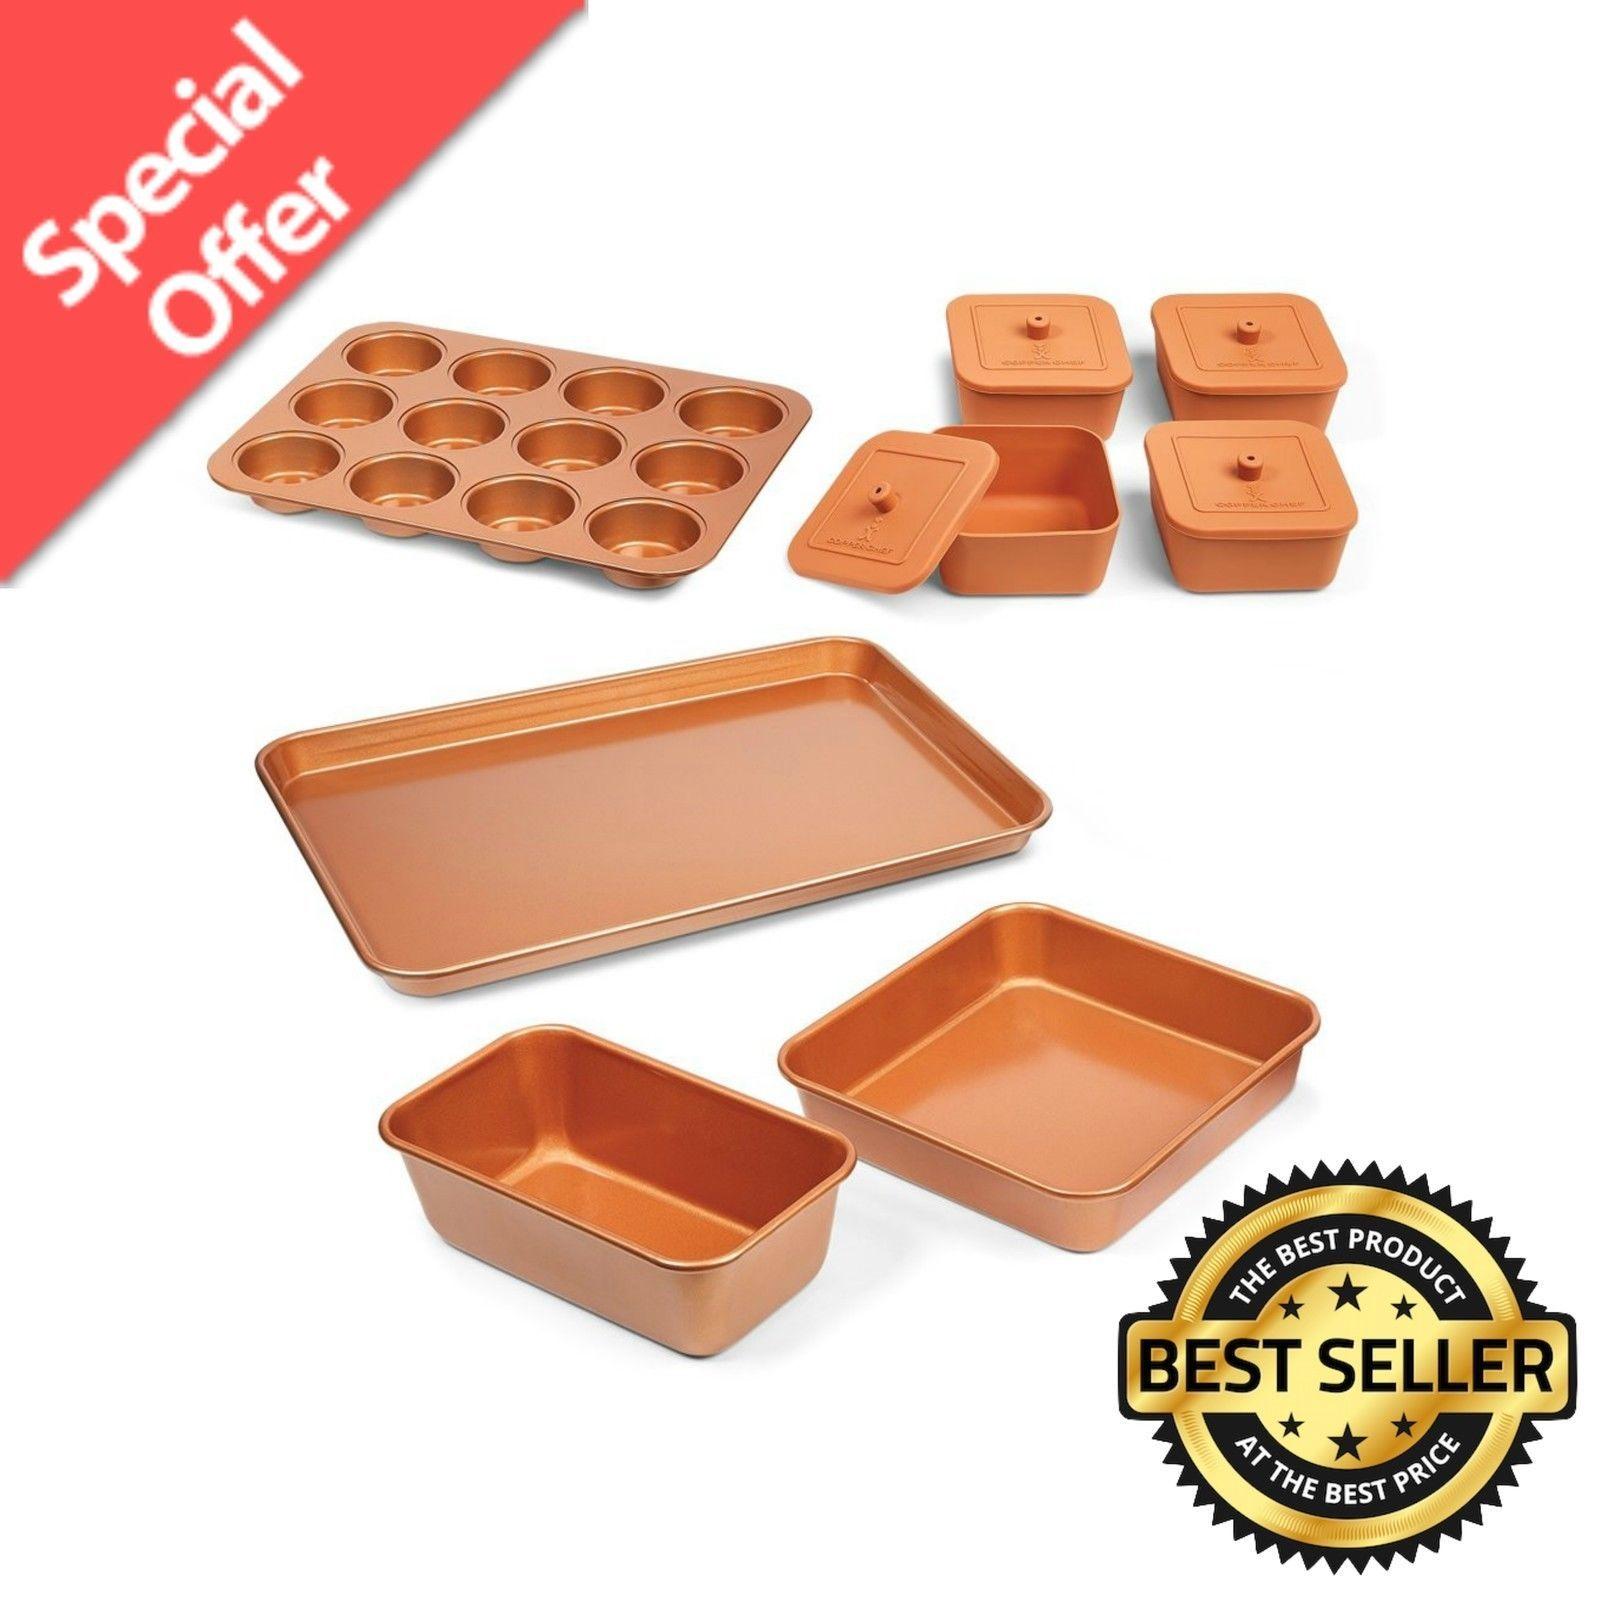 Copper Chef 12 Pcs Bakeware Set Non Stick Cookie Sheet Pan Ramekin